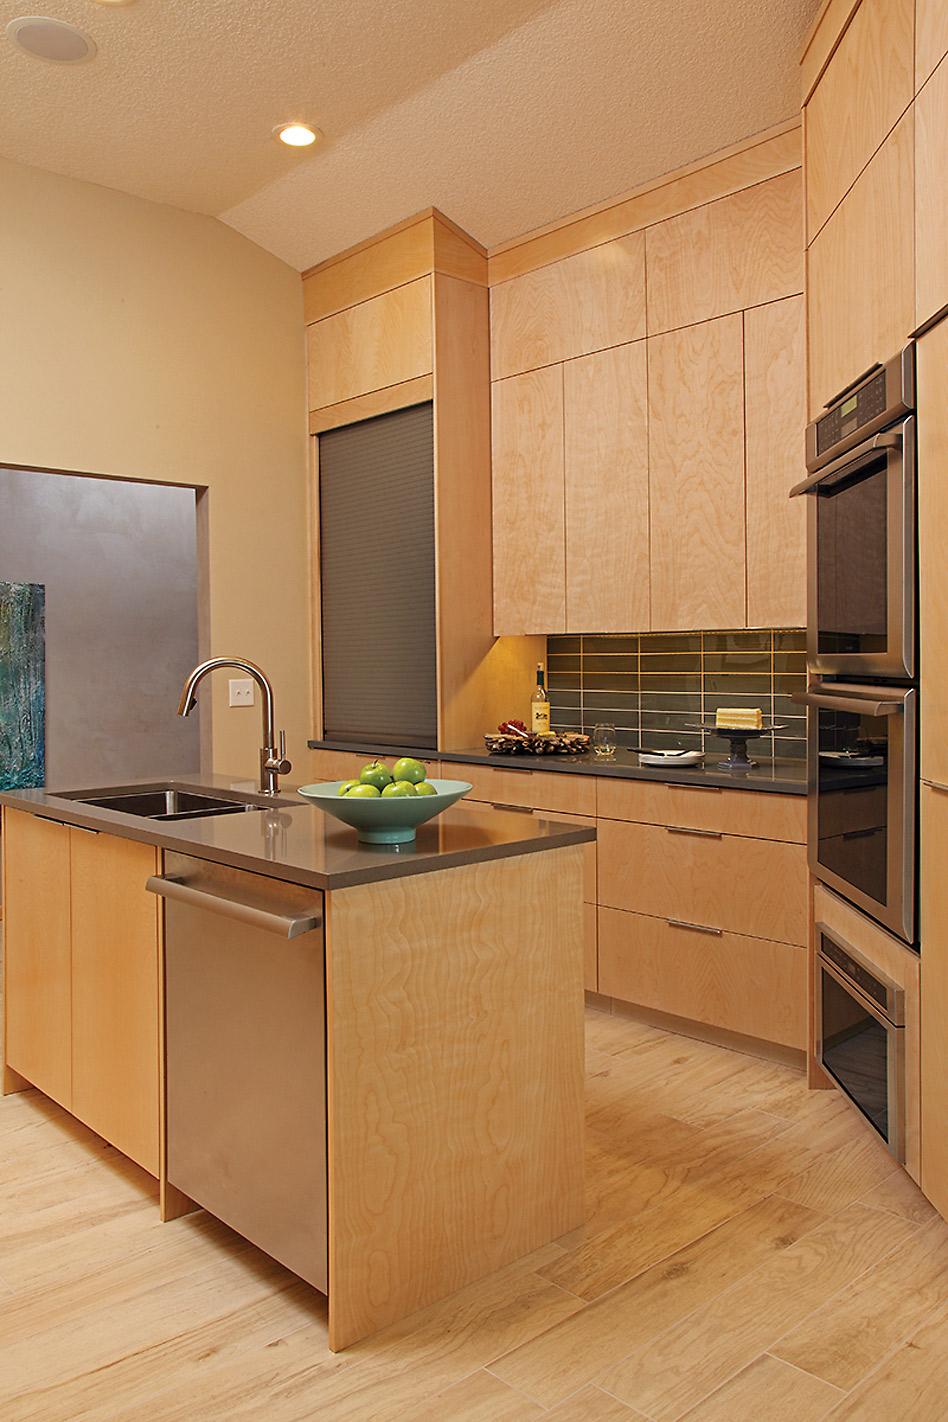 Sheree-Vincent-Fusion-Designed_ASID-Kitchen-Tour_main_X